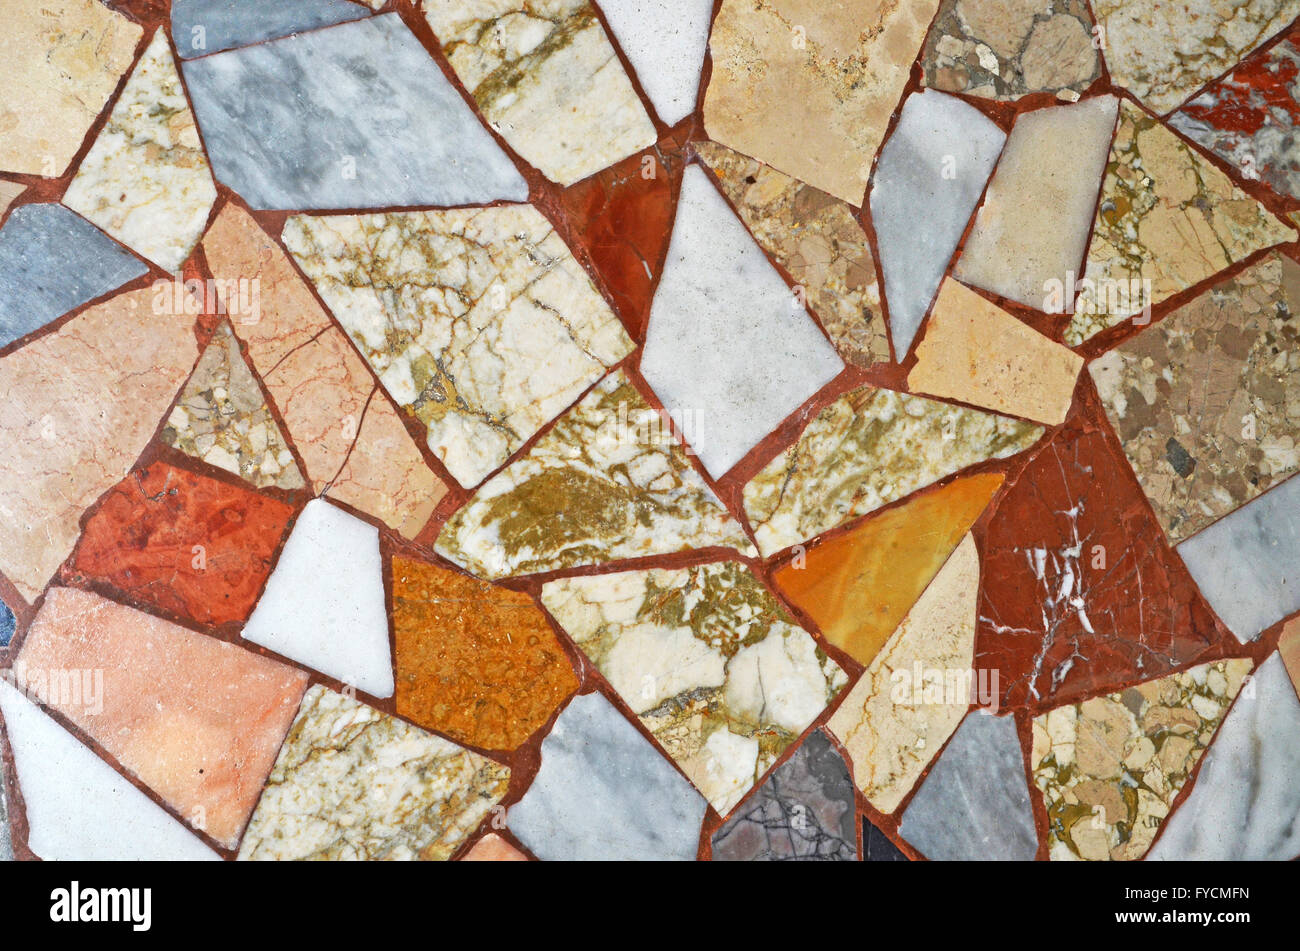 marble mosaic pattern background - Stock Image